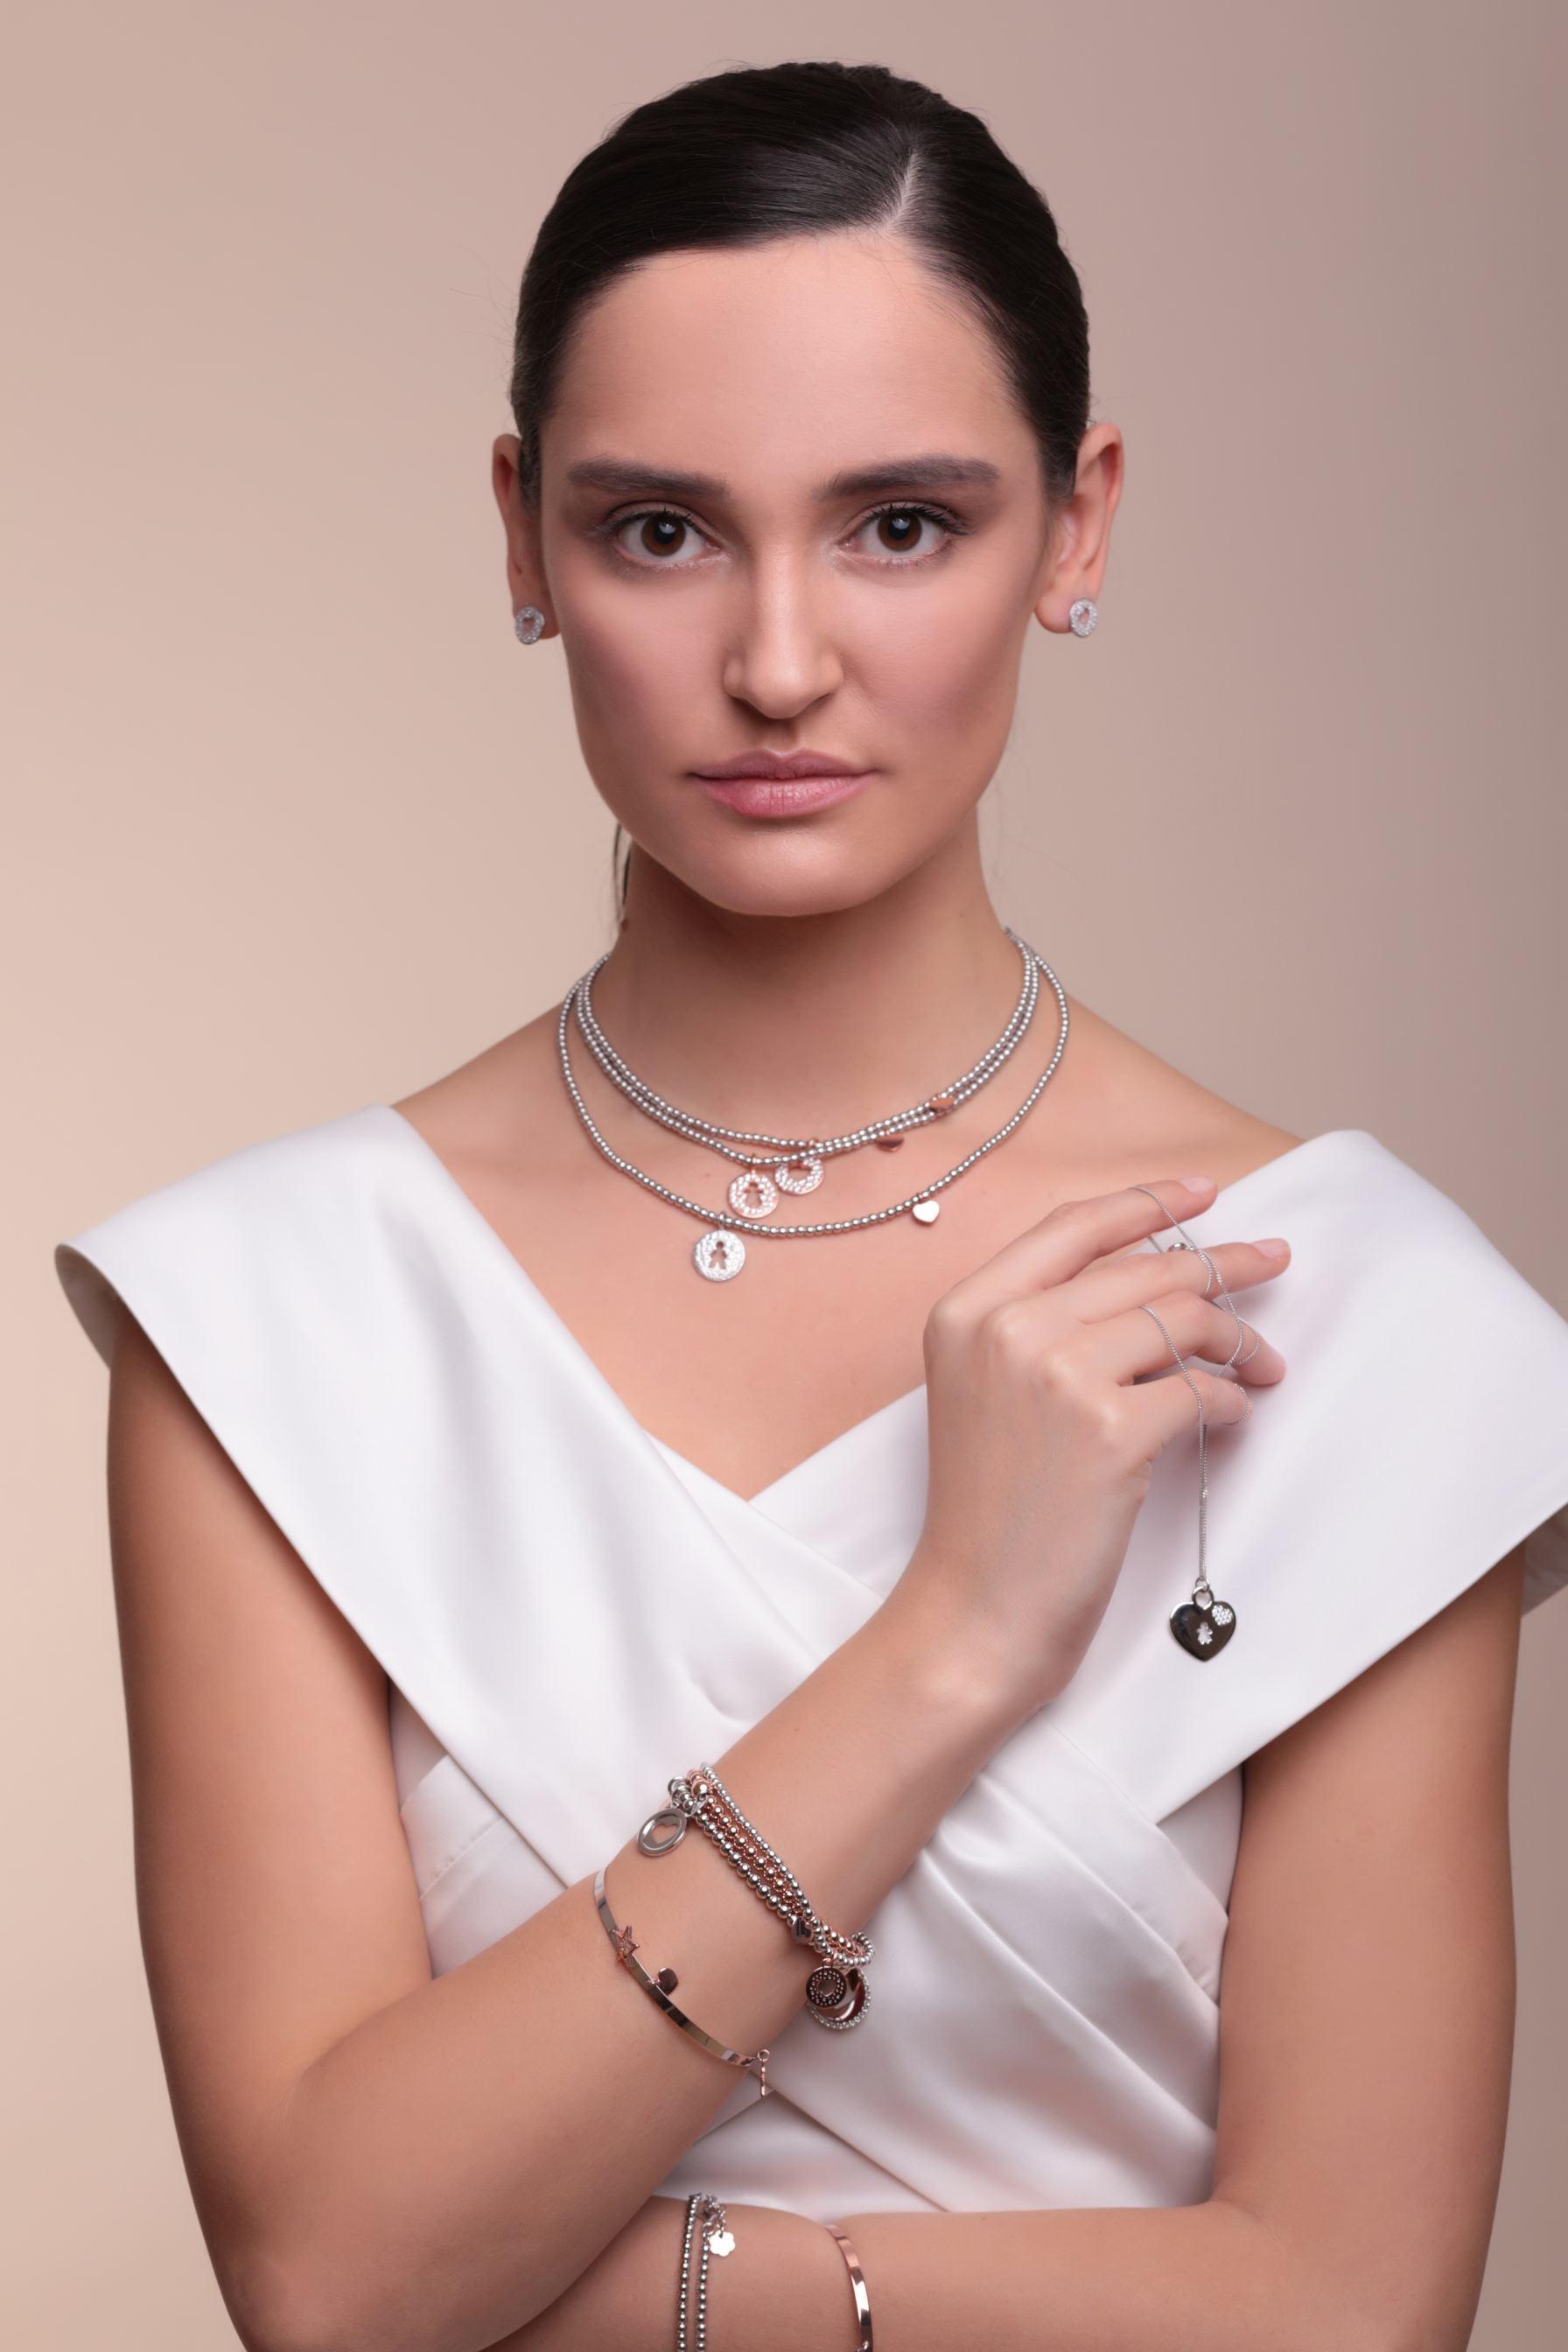 Srebrne nausnice, redovna cijena 320kn, s popustom 160kn, srebrna ogrlica, redovna cijena 1090kn, s popustom 545kn, Zaks